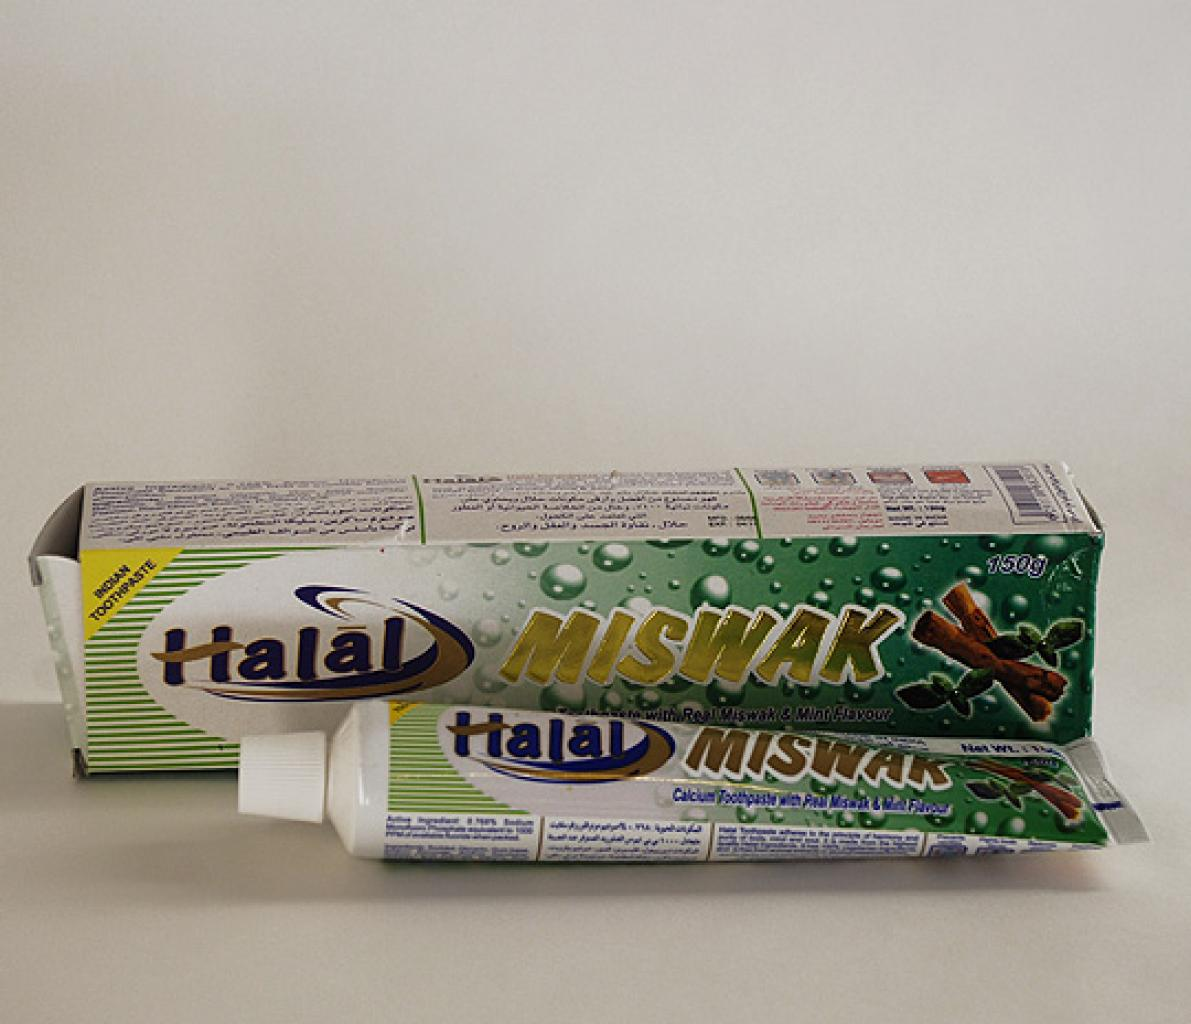 Halal Miswak Toothpaste gi494